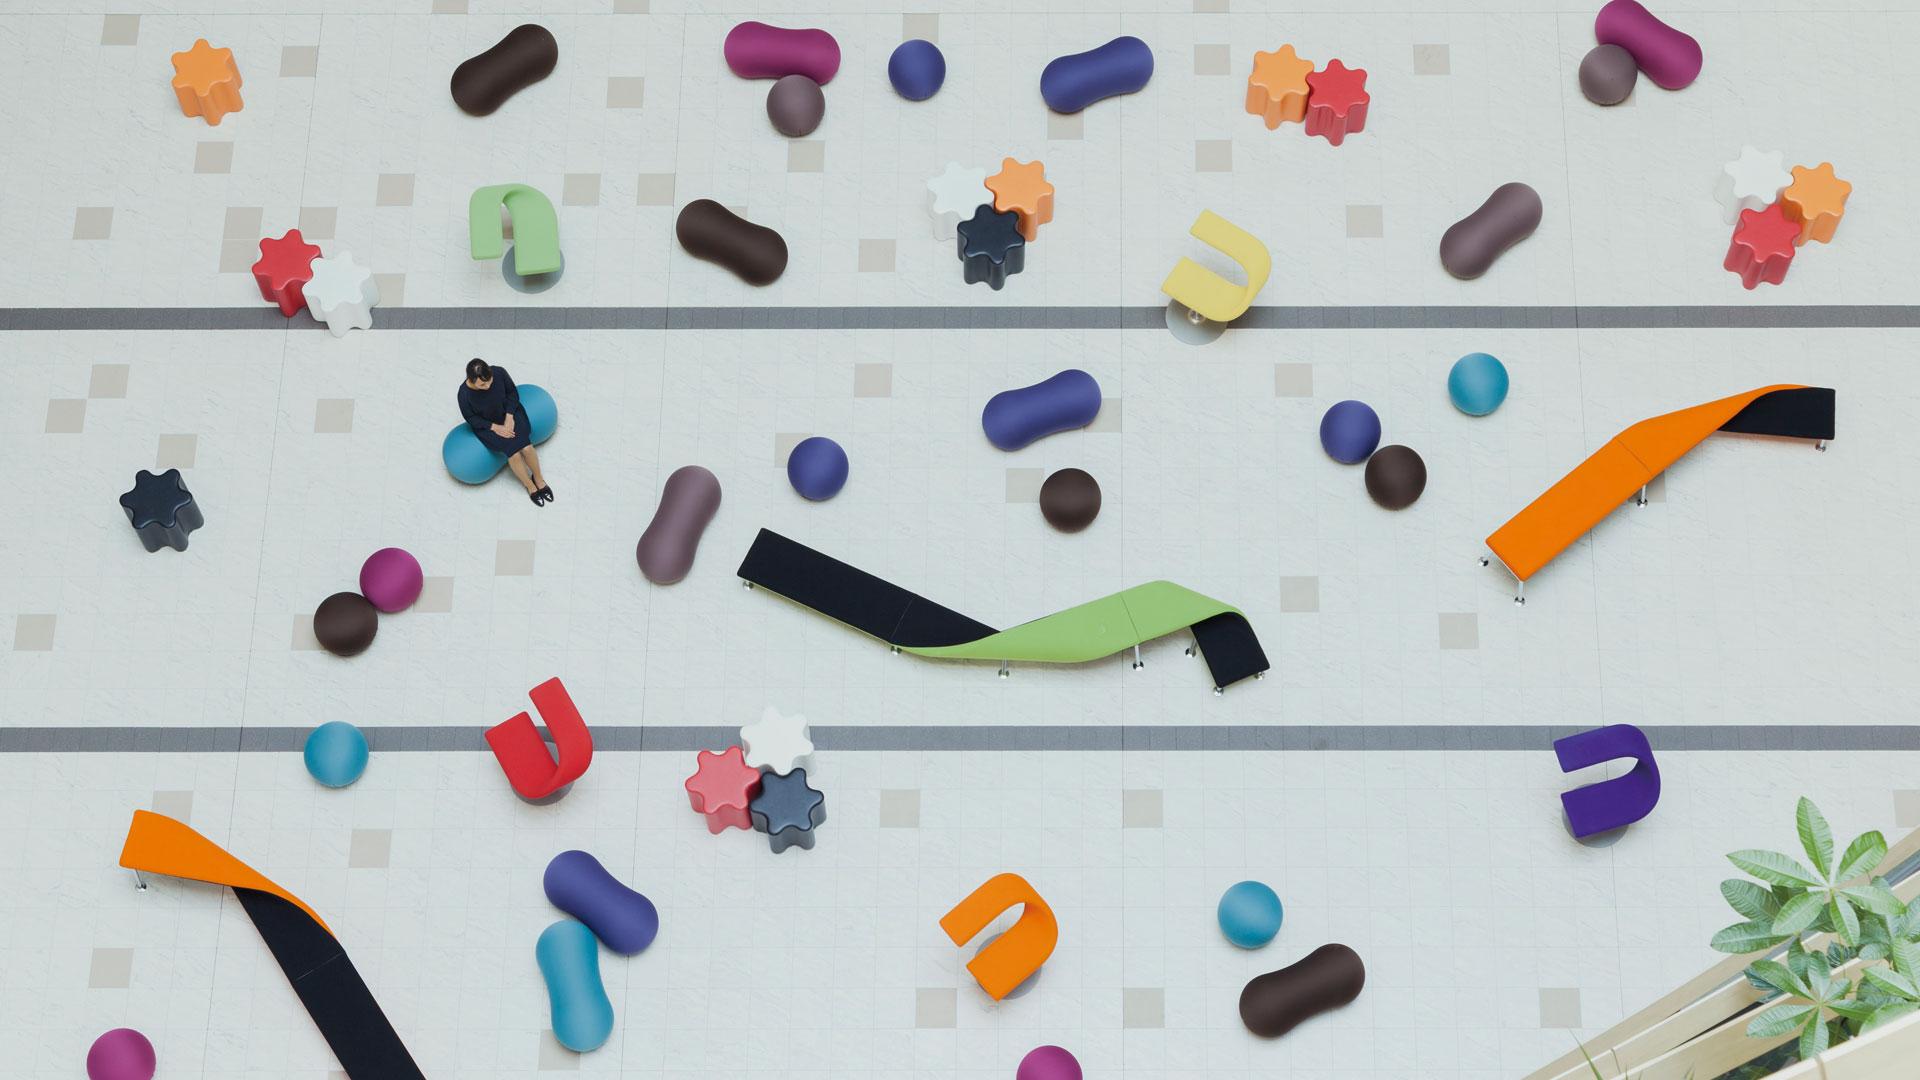 【50%OFF】 【個性派必見!カジュアルな草履バッグセット】白/水玉/ドット/カラフル/縮緬/ちりめん/草履セット/合皮/日本製/フリーサイズ/送料無料-和装・和服